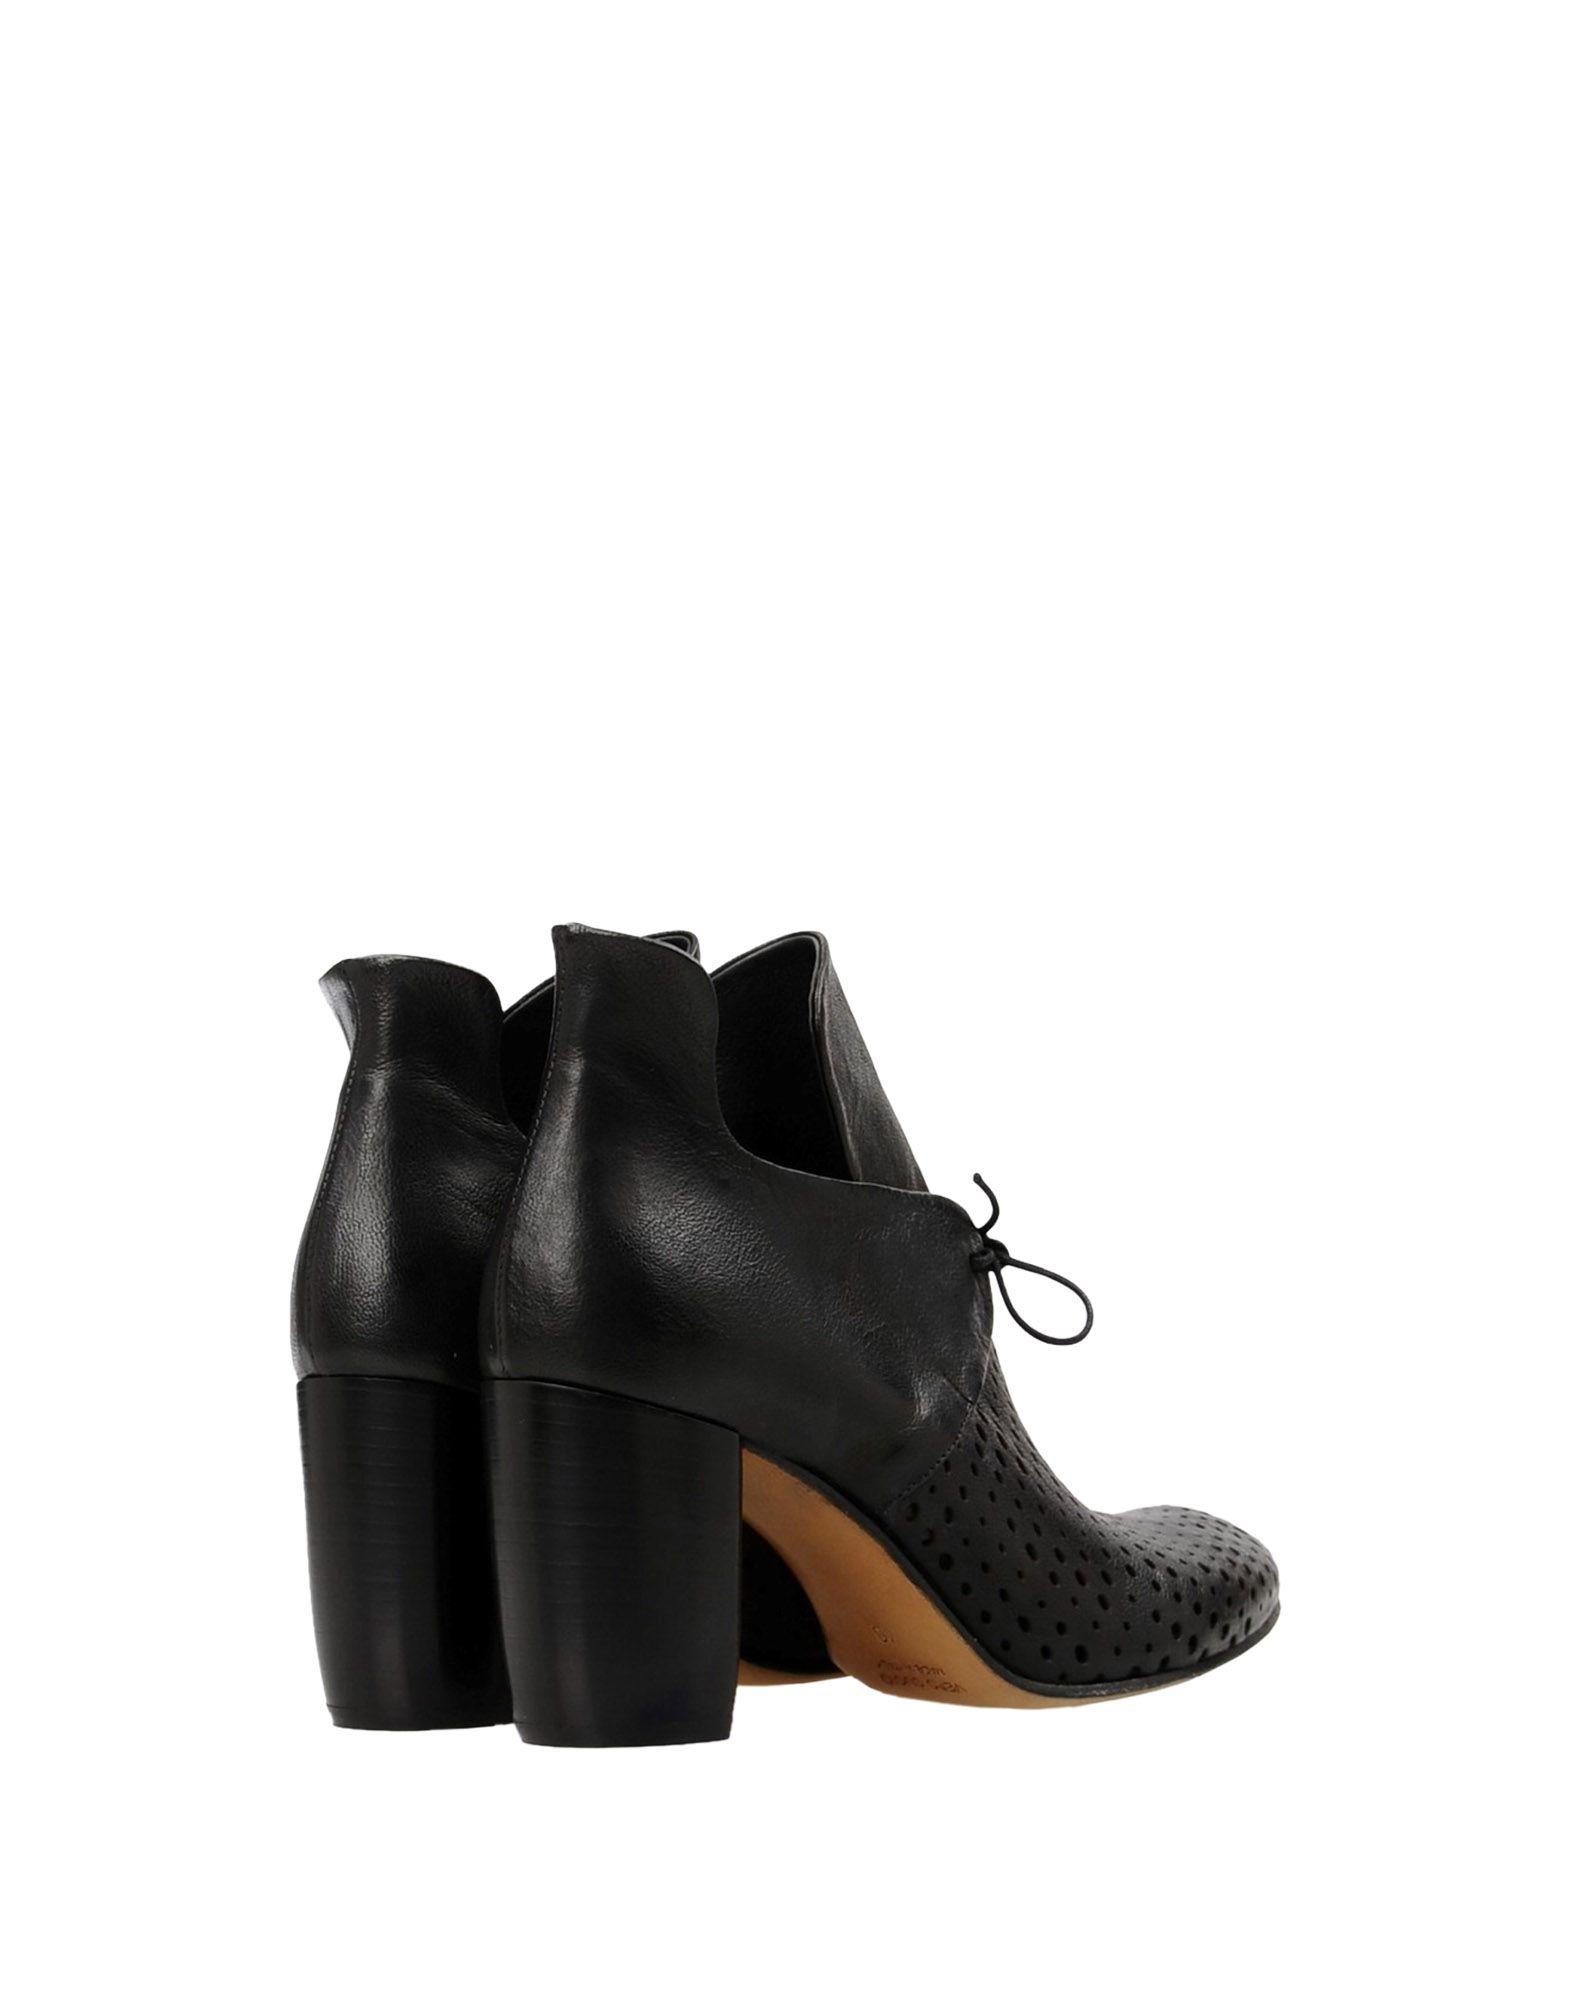 Leonardo Principi Gute Schnürschuhe Damen  11426416WC Gute Principi Qualität beliebte Schuhe 2fb8f9